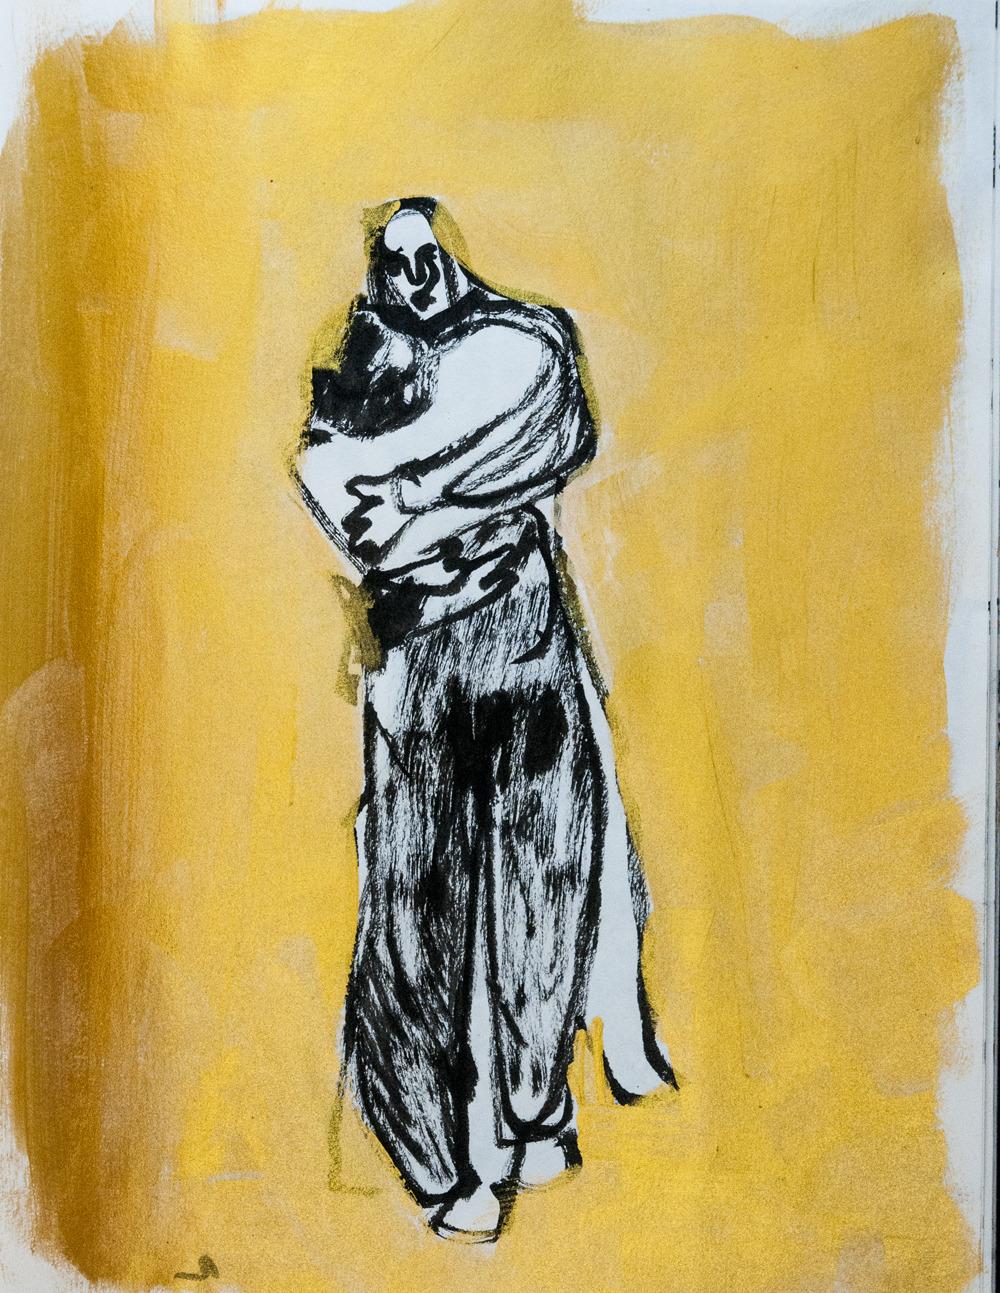 Envelope Painting by Giorgia Madiai Fuchs